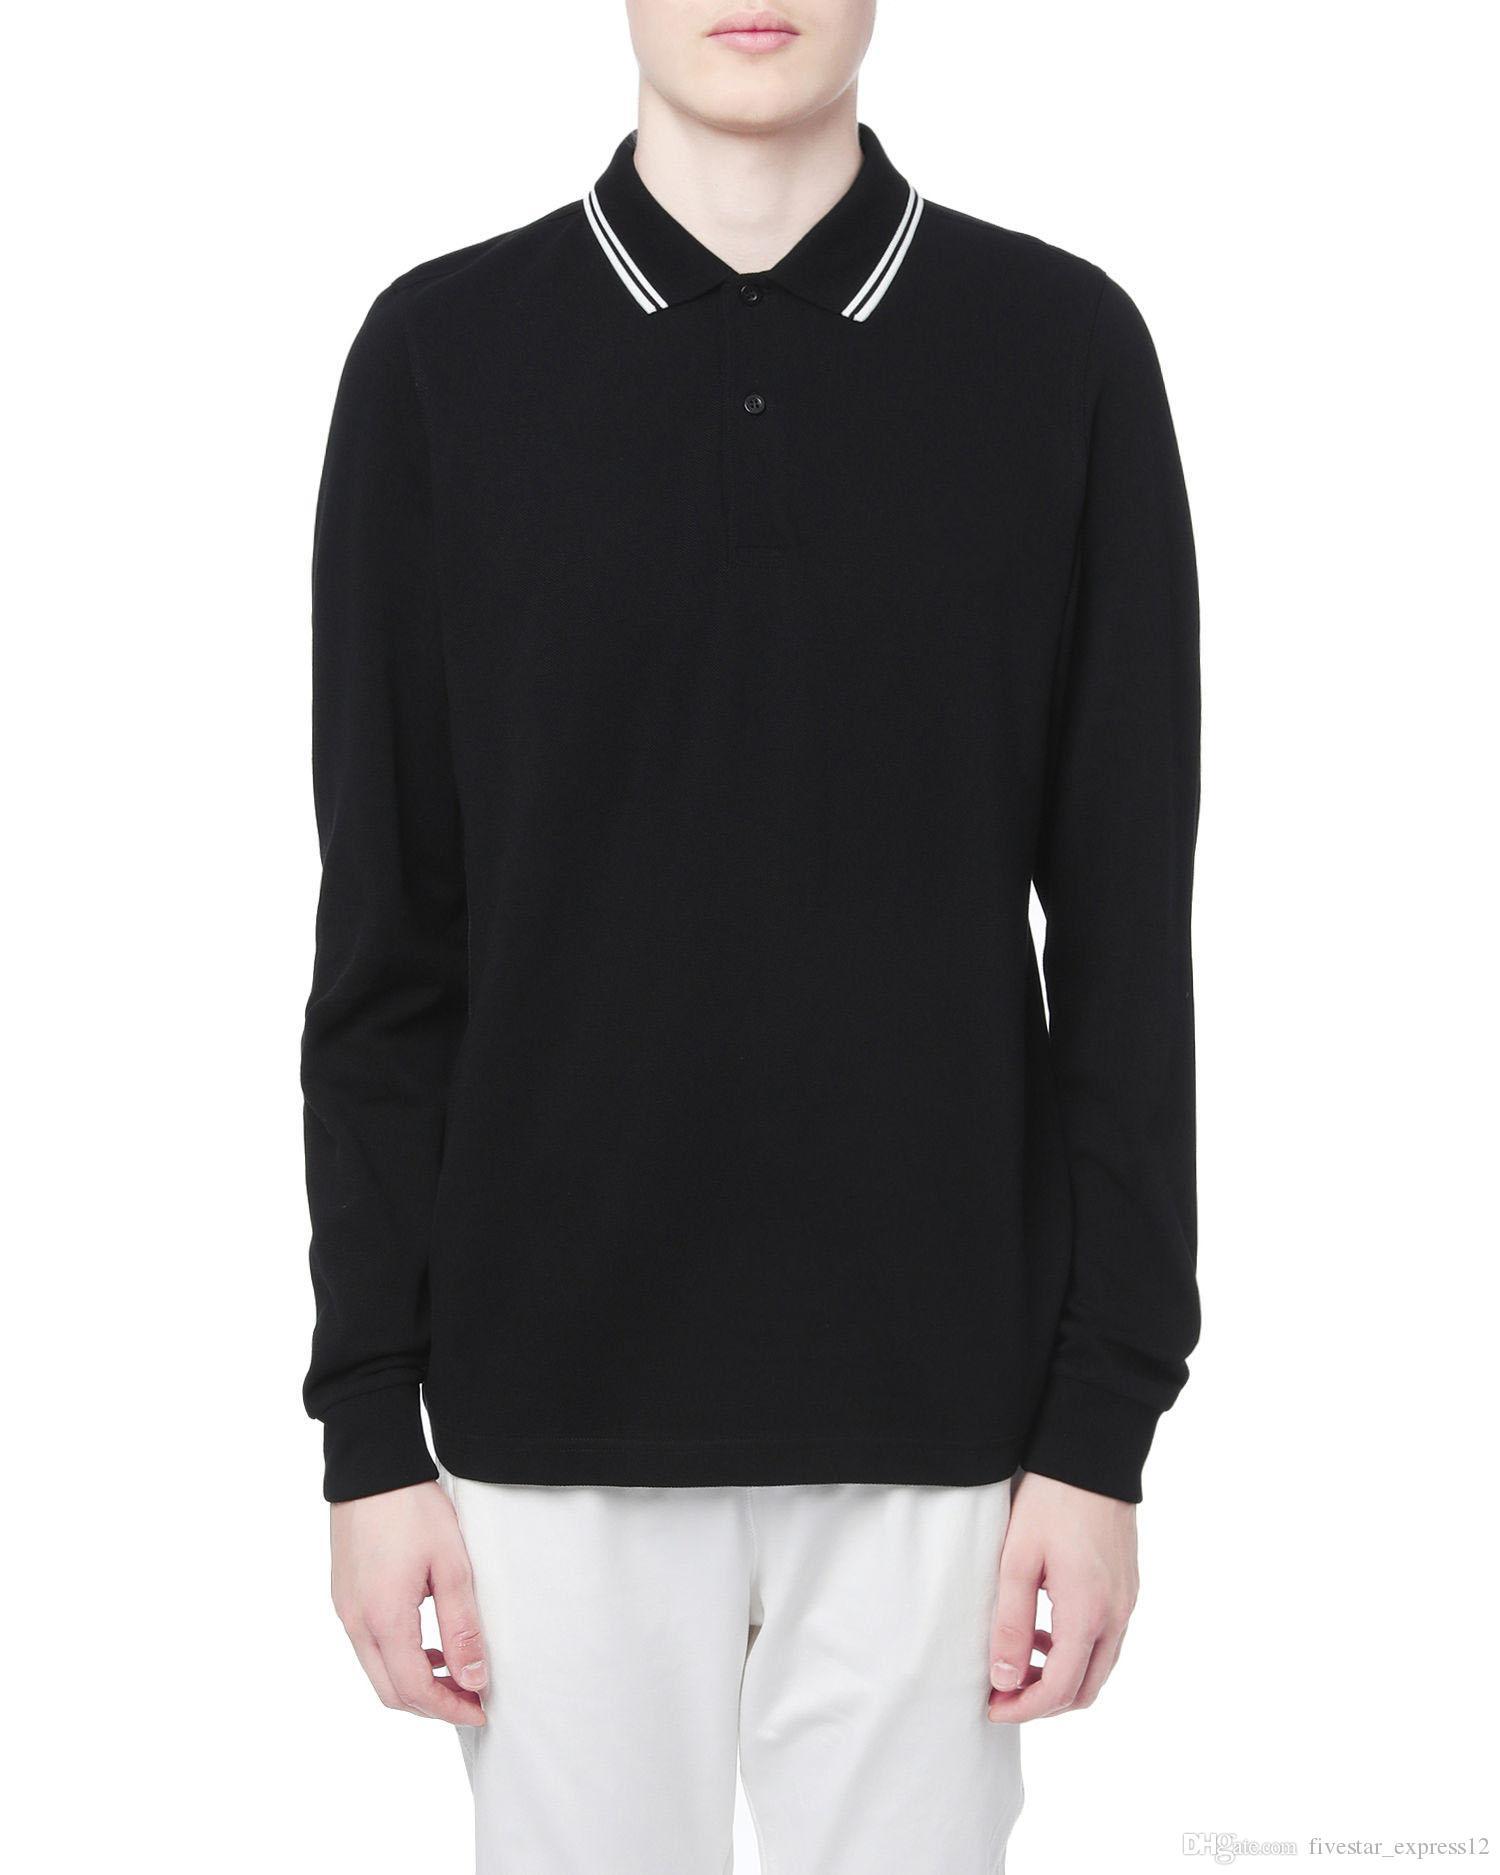 Gran Bretaña Hombres Londres Polo casual Camisetas de manga larga Camiseta sólida 100% algodón brit clásico camisa ocio camisetas Tops Tamaño negro S-XXL